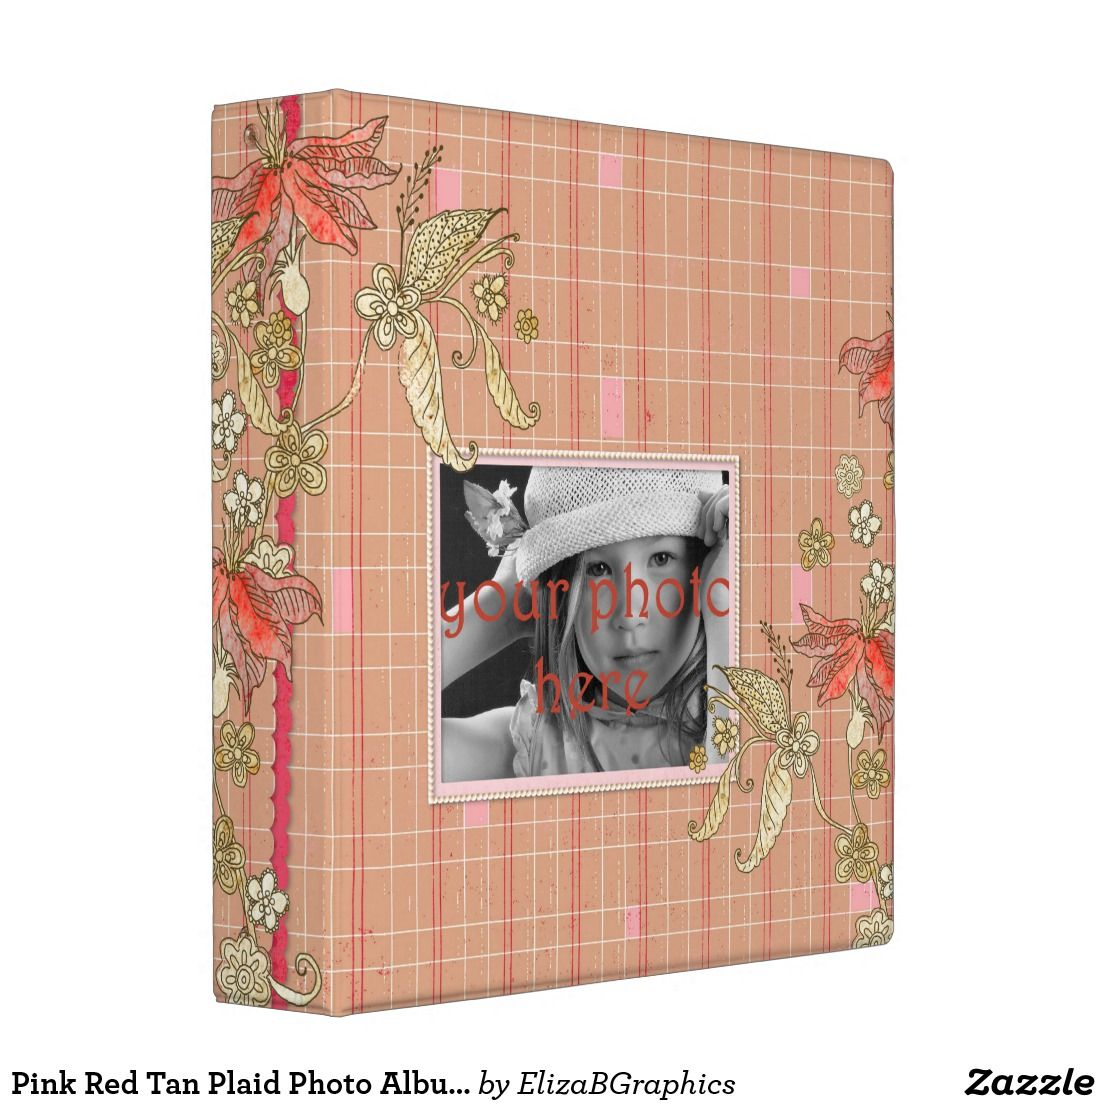 Pink Red Tan Plaid Photo Album Scrapbook Binder